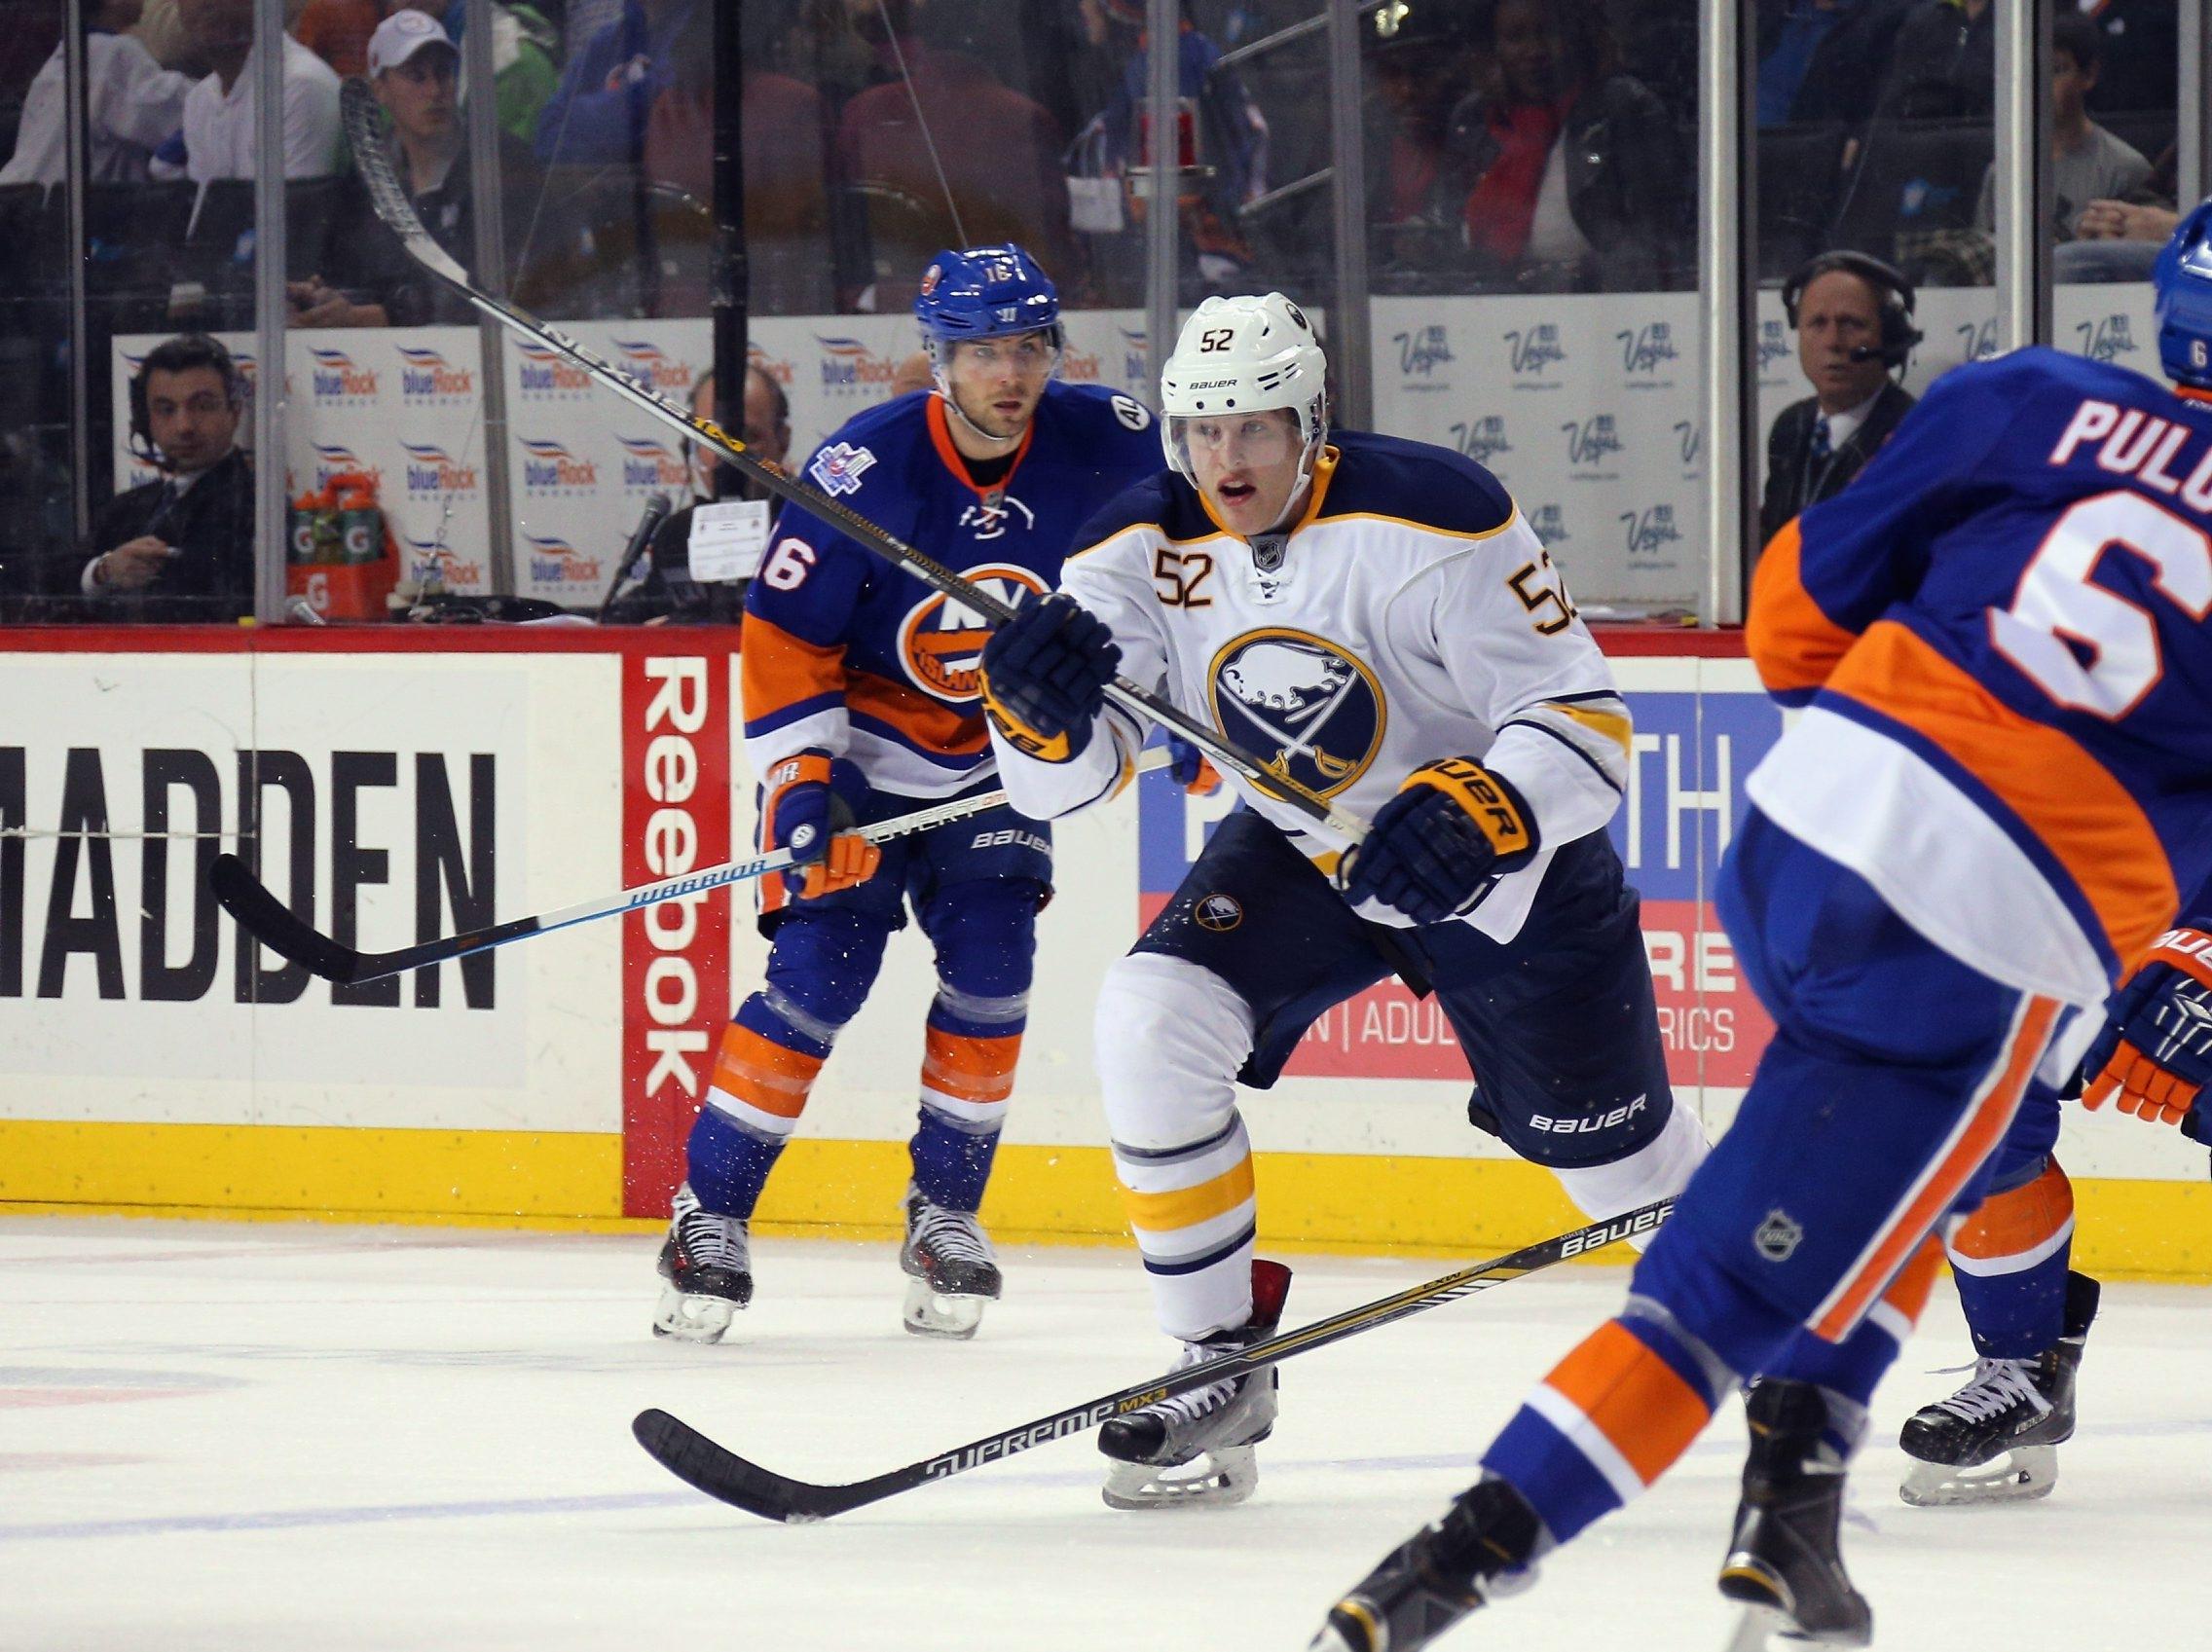 Hudson Fasching skates against the New York Islanders in the season finale Saturday.